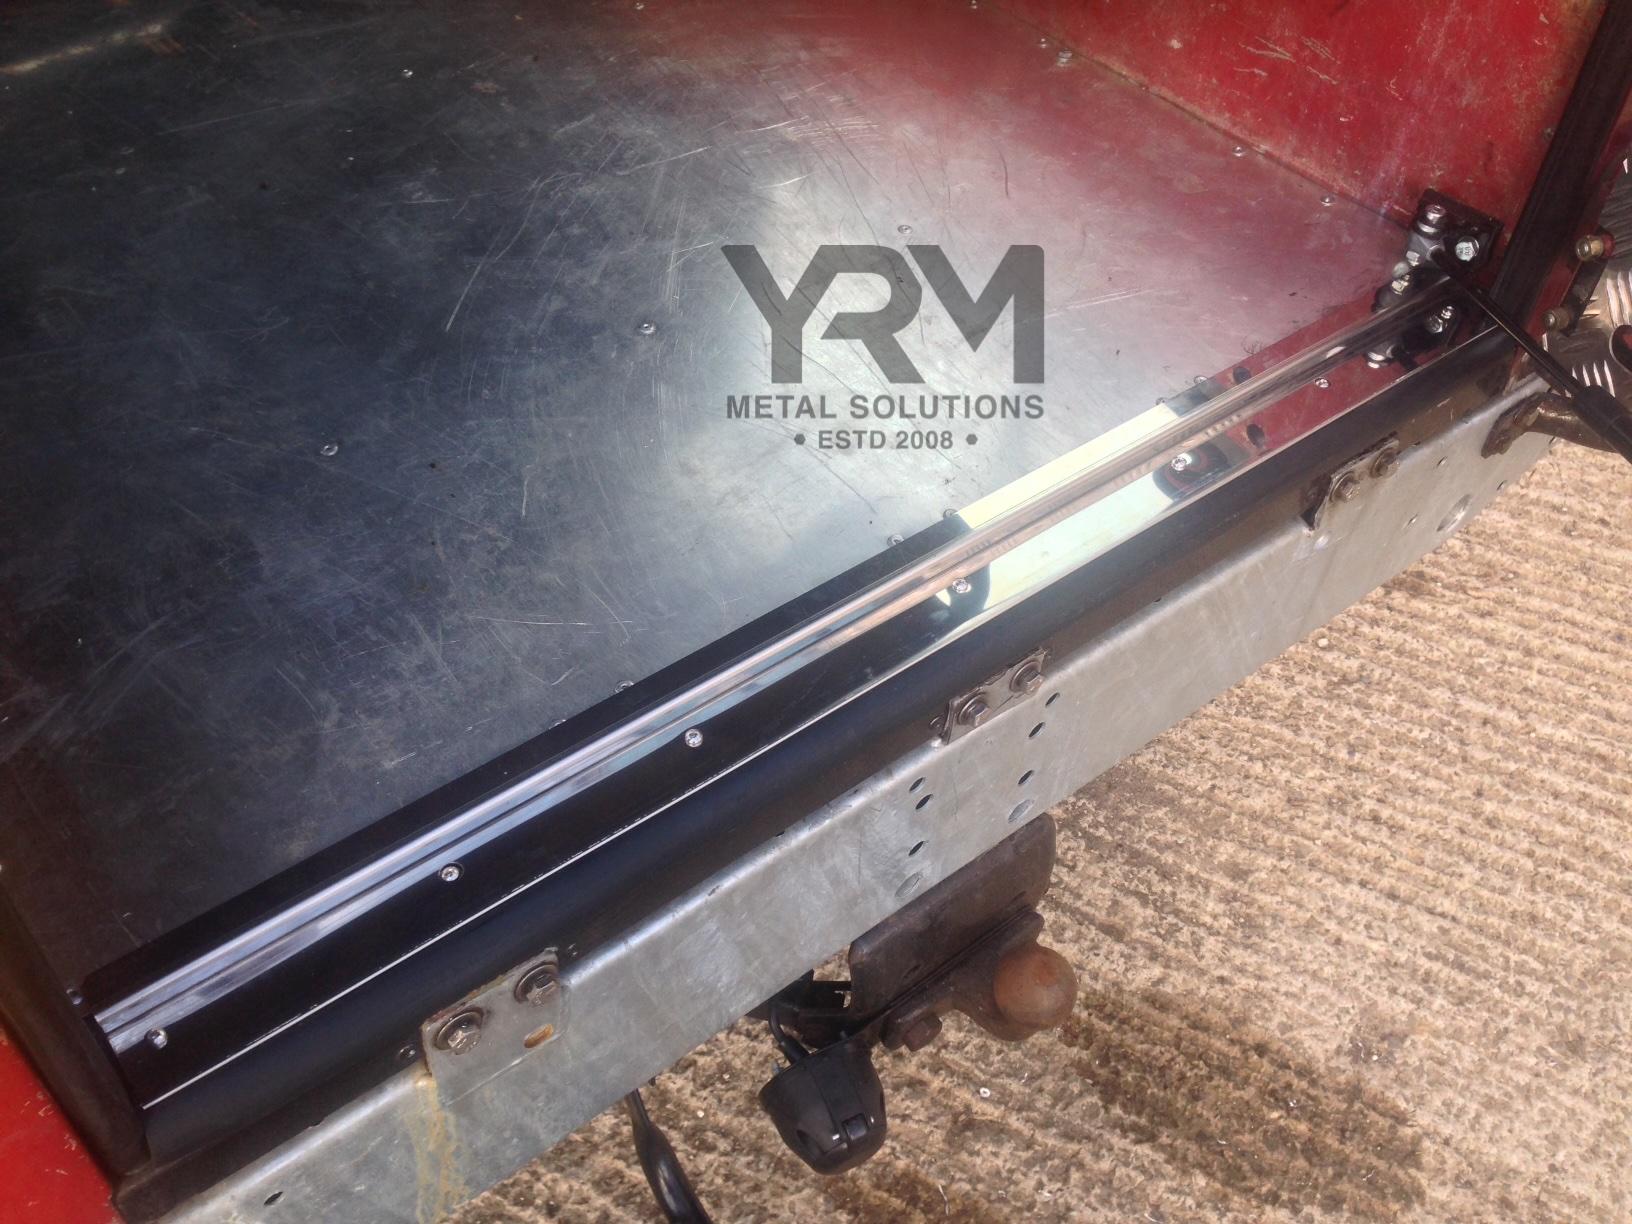 Stainless Steel Rear Safari Door Thresh Amp Rubber Yrm